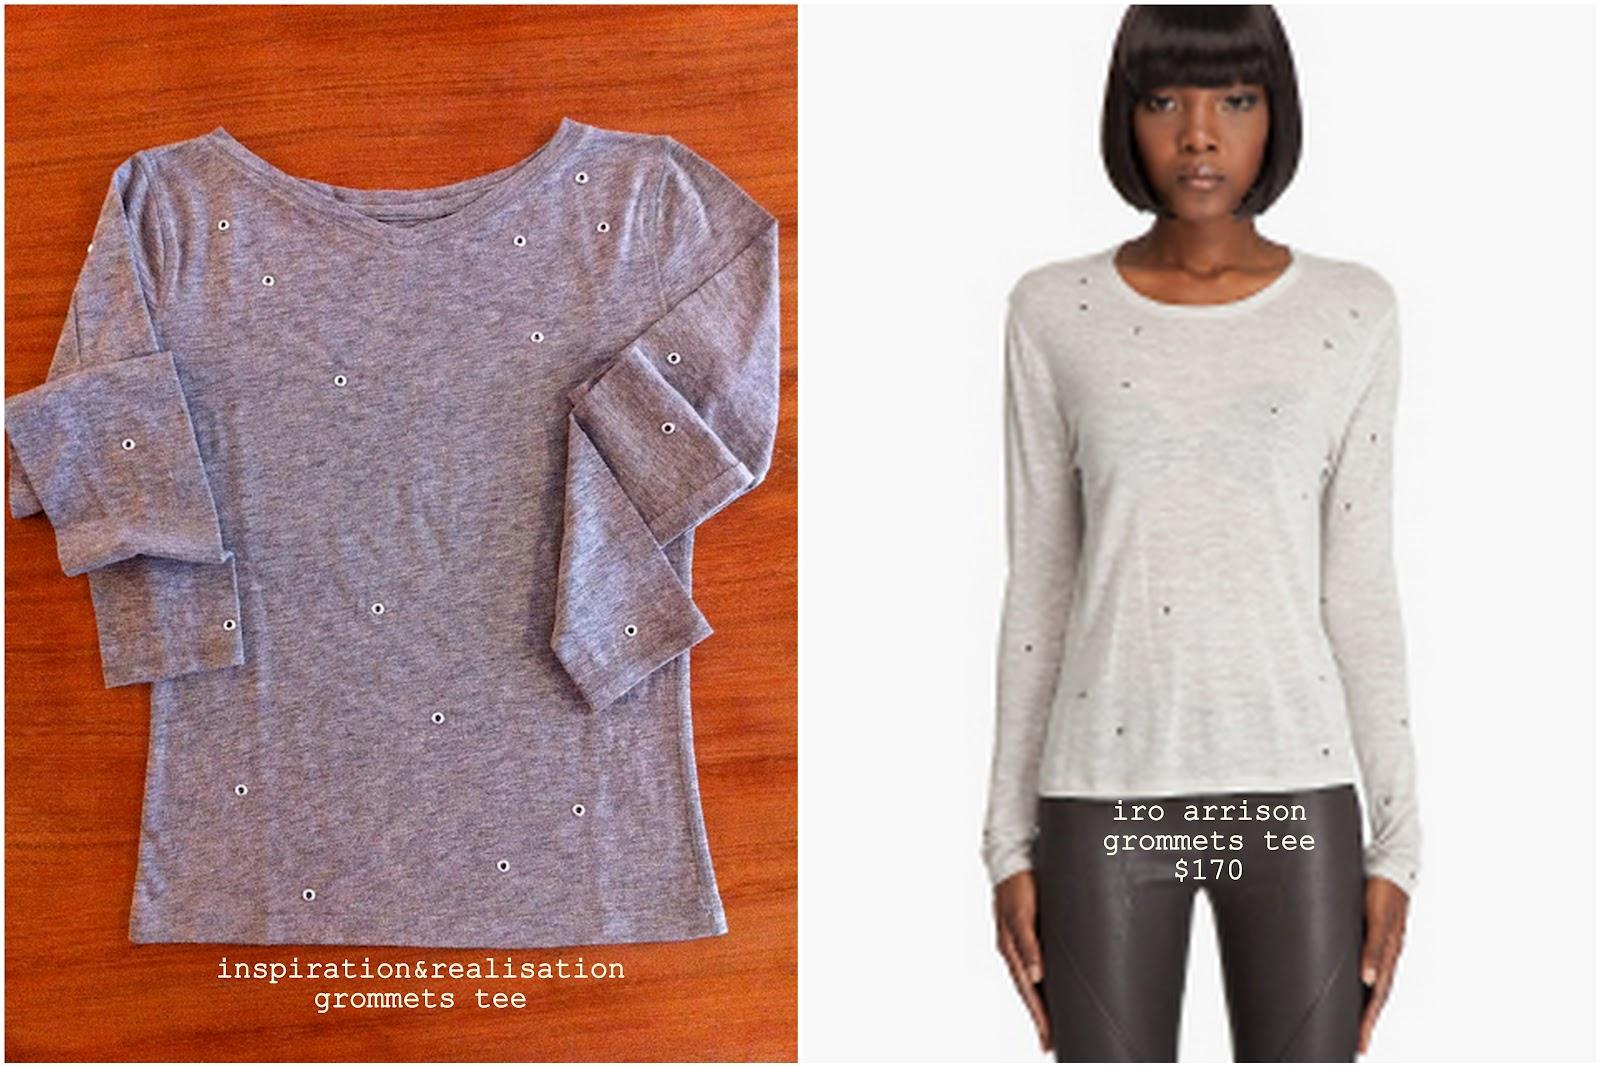 dd87072fc6 inspiration and realisation  DIY fashion blog  step-by-step eyelets